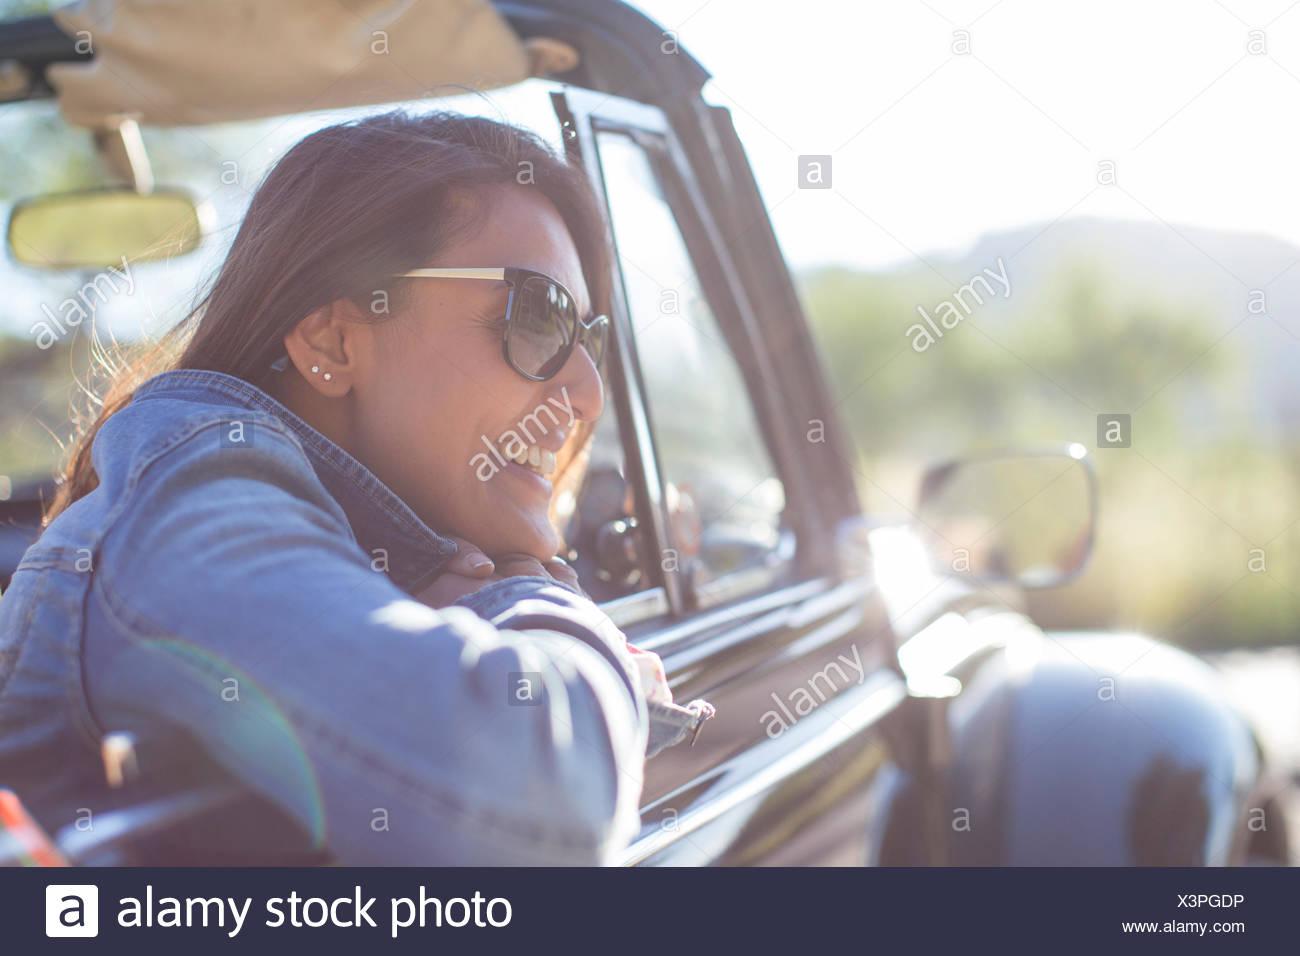 Mature woman in convertible car - Stock Image